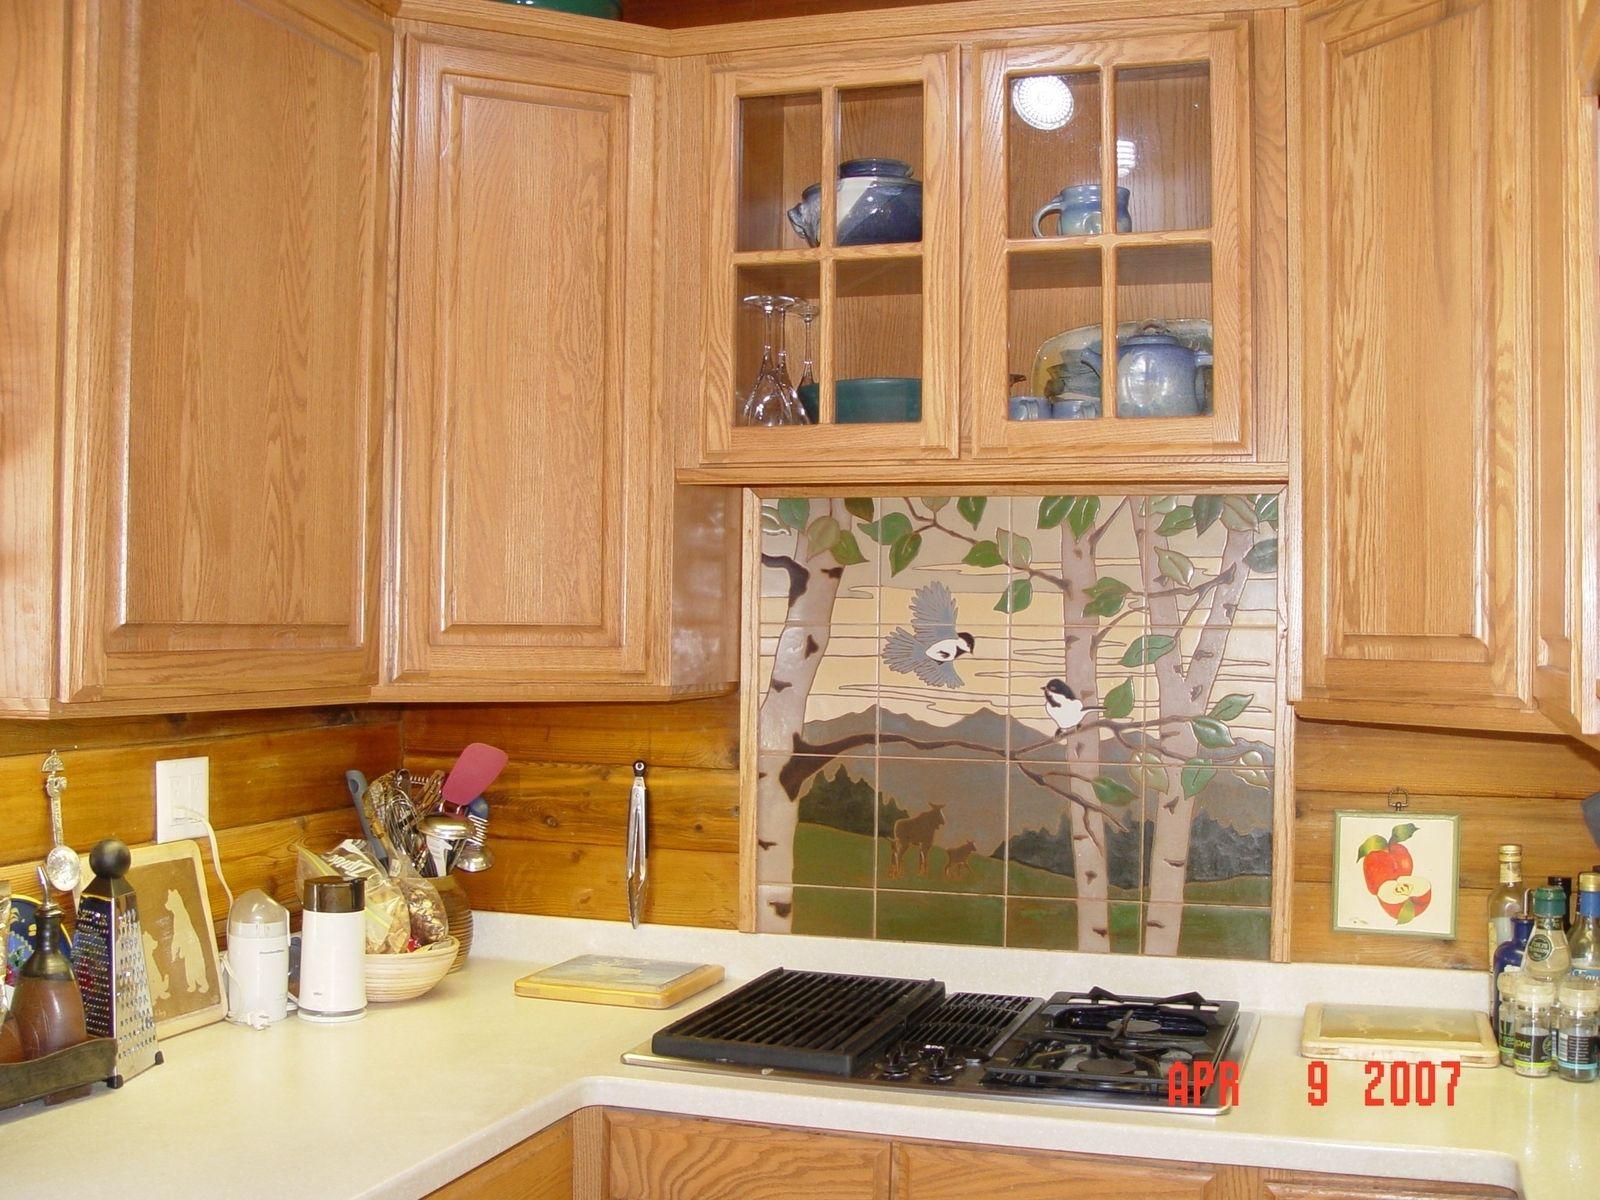 Easy Backsplash Tile Ideas For Kitchen